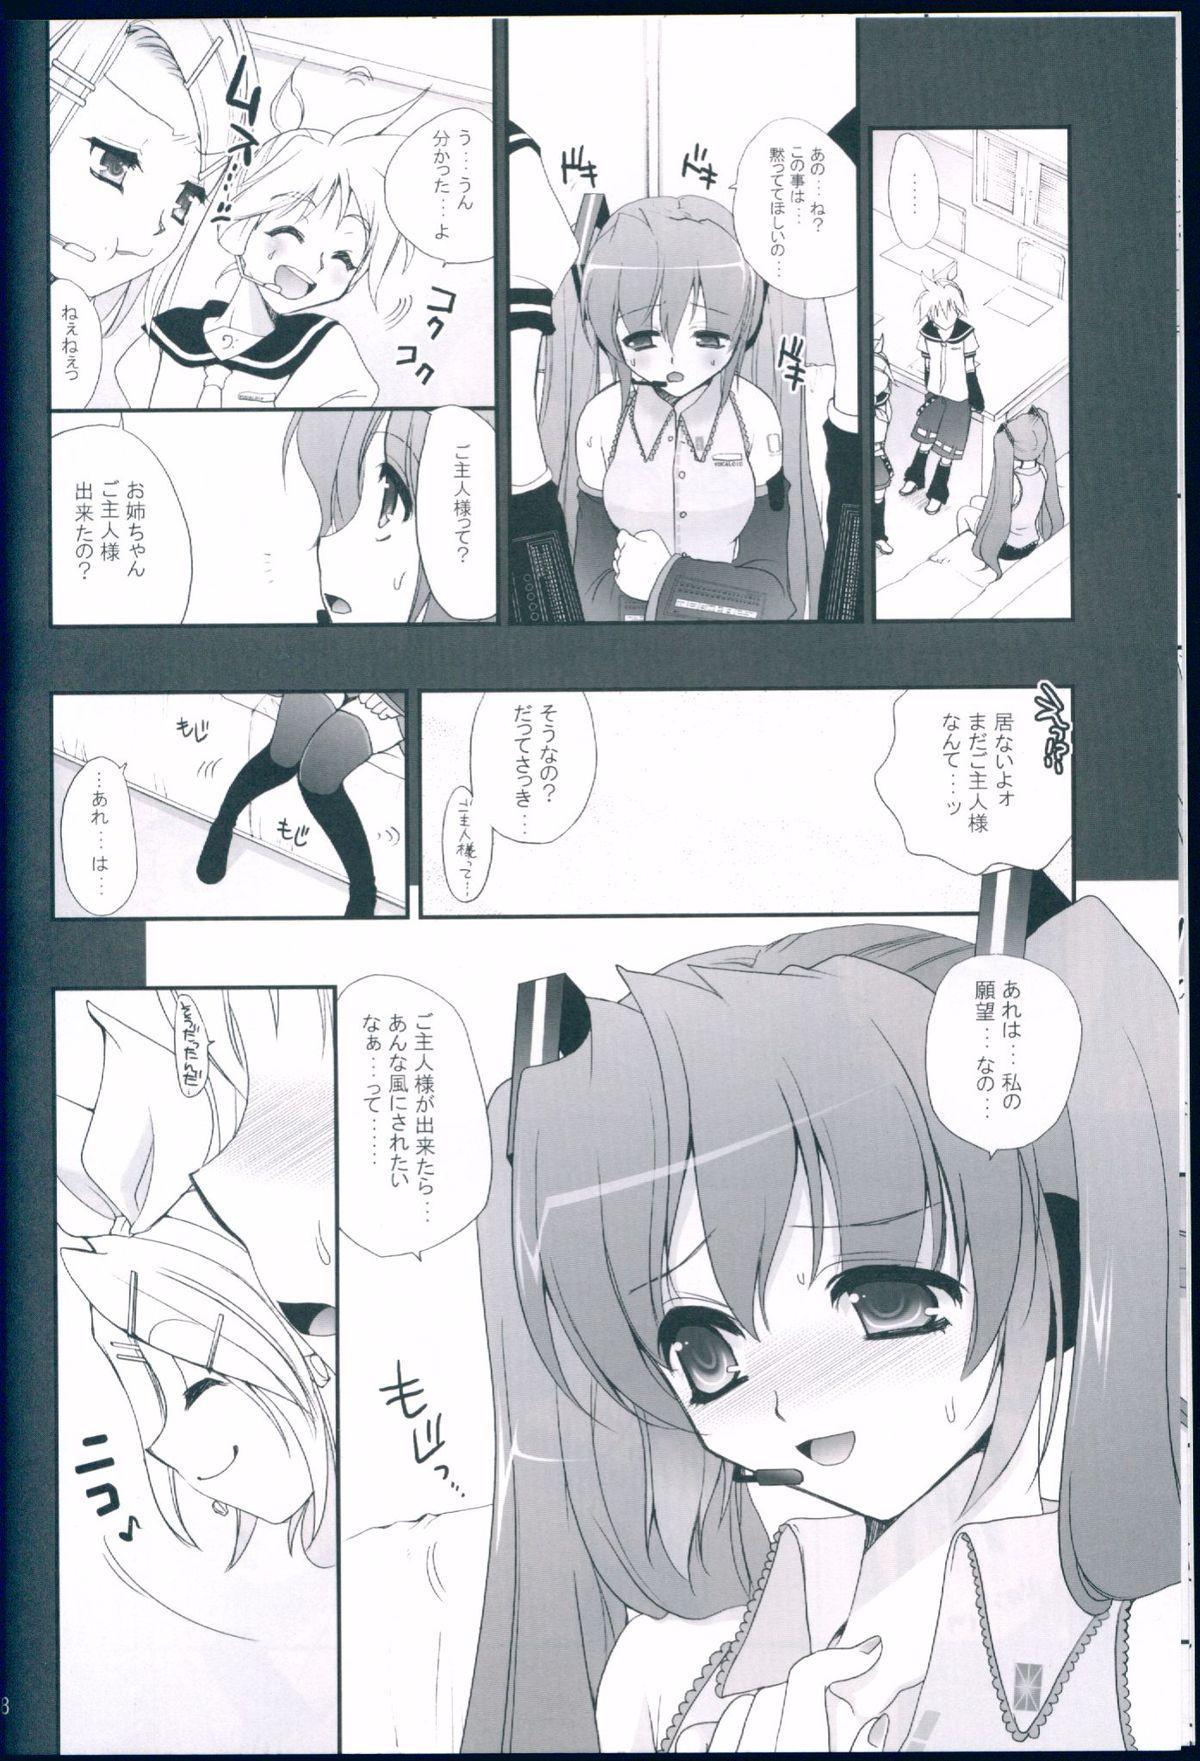 R Juu - Hatsune Miku Kenkan 7